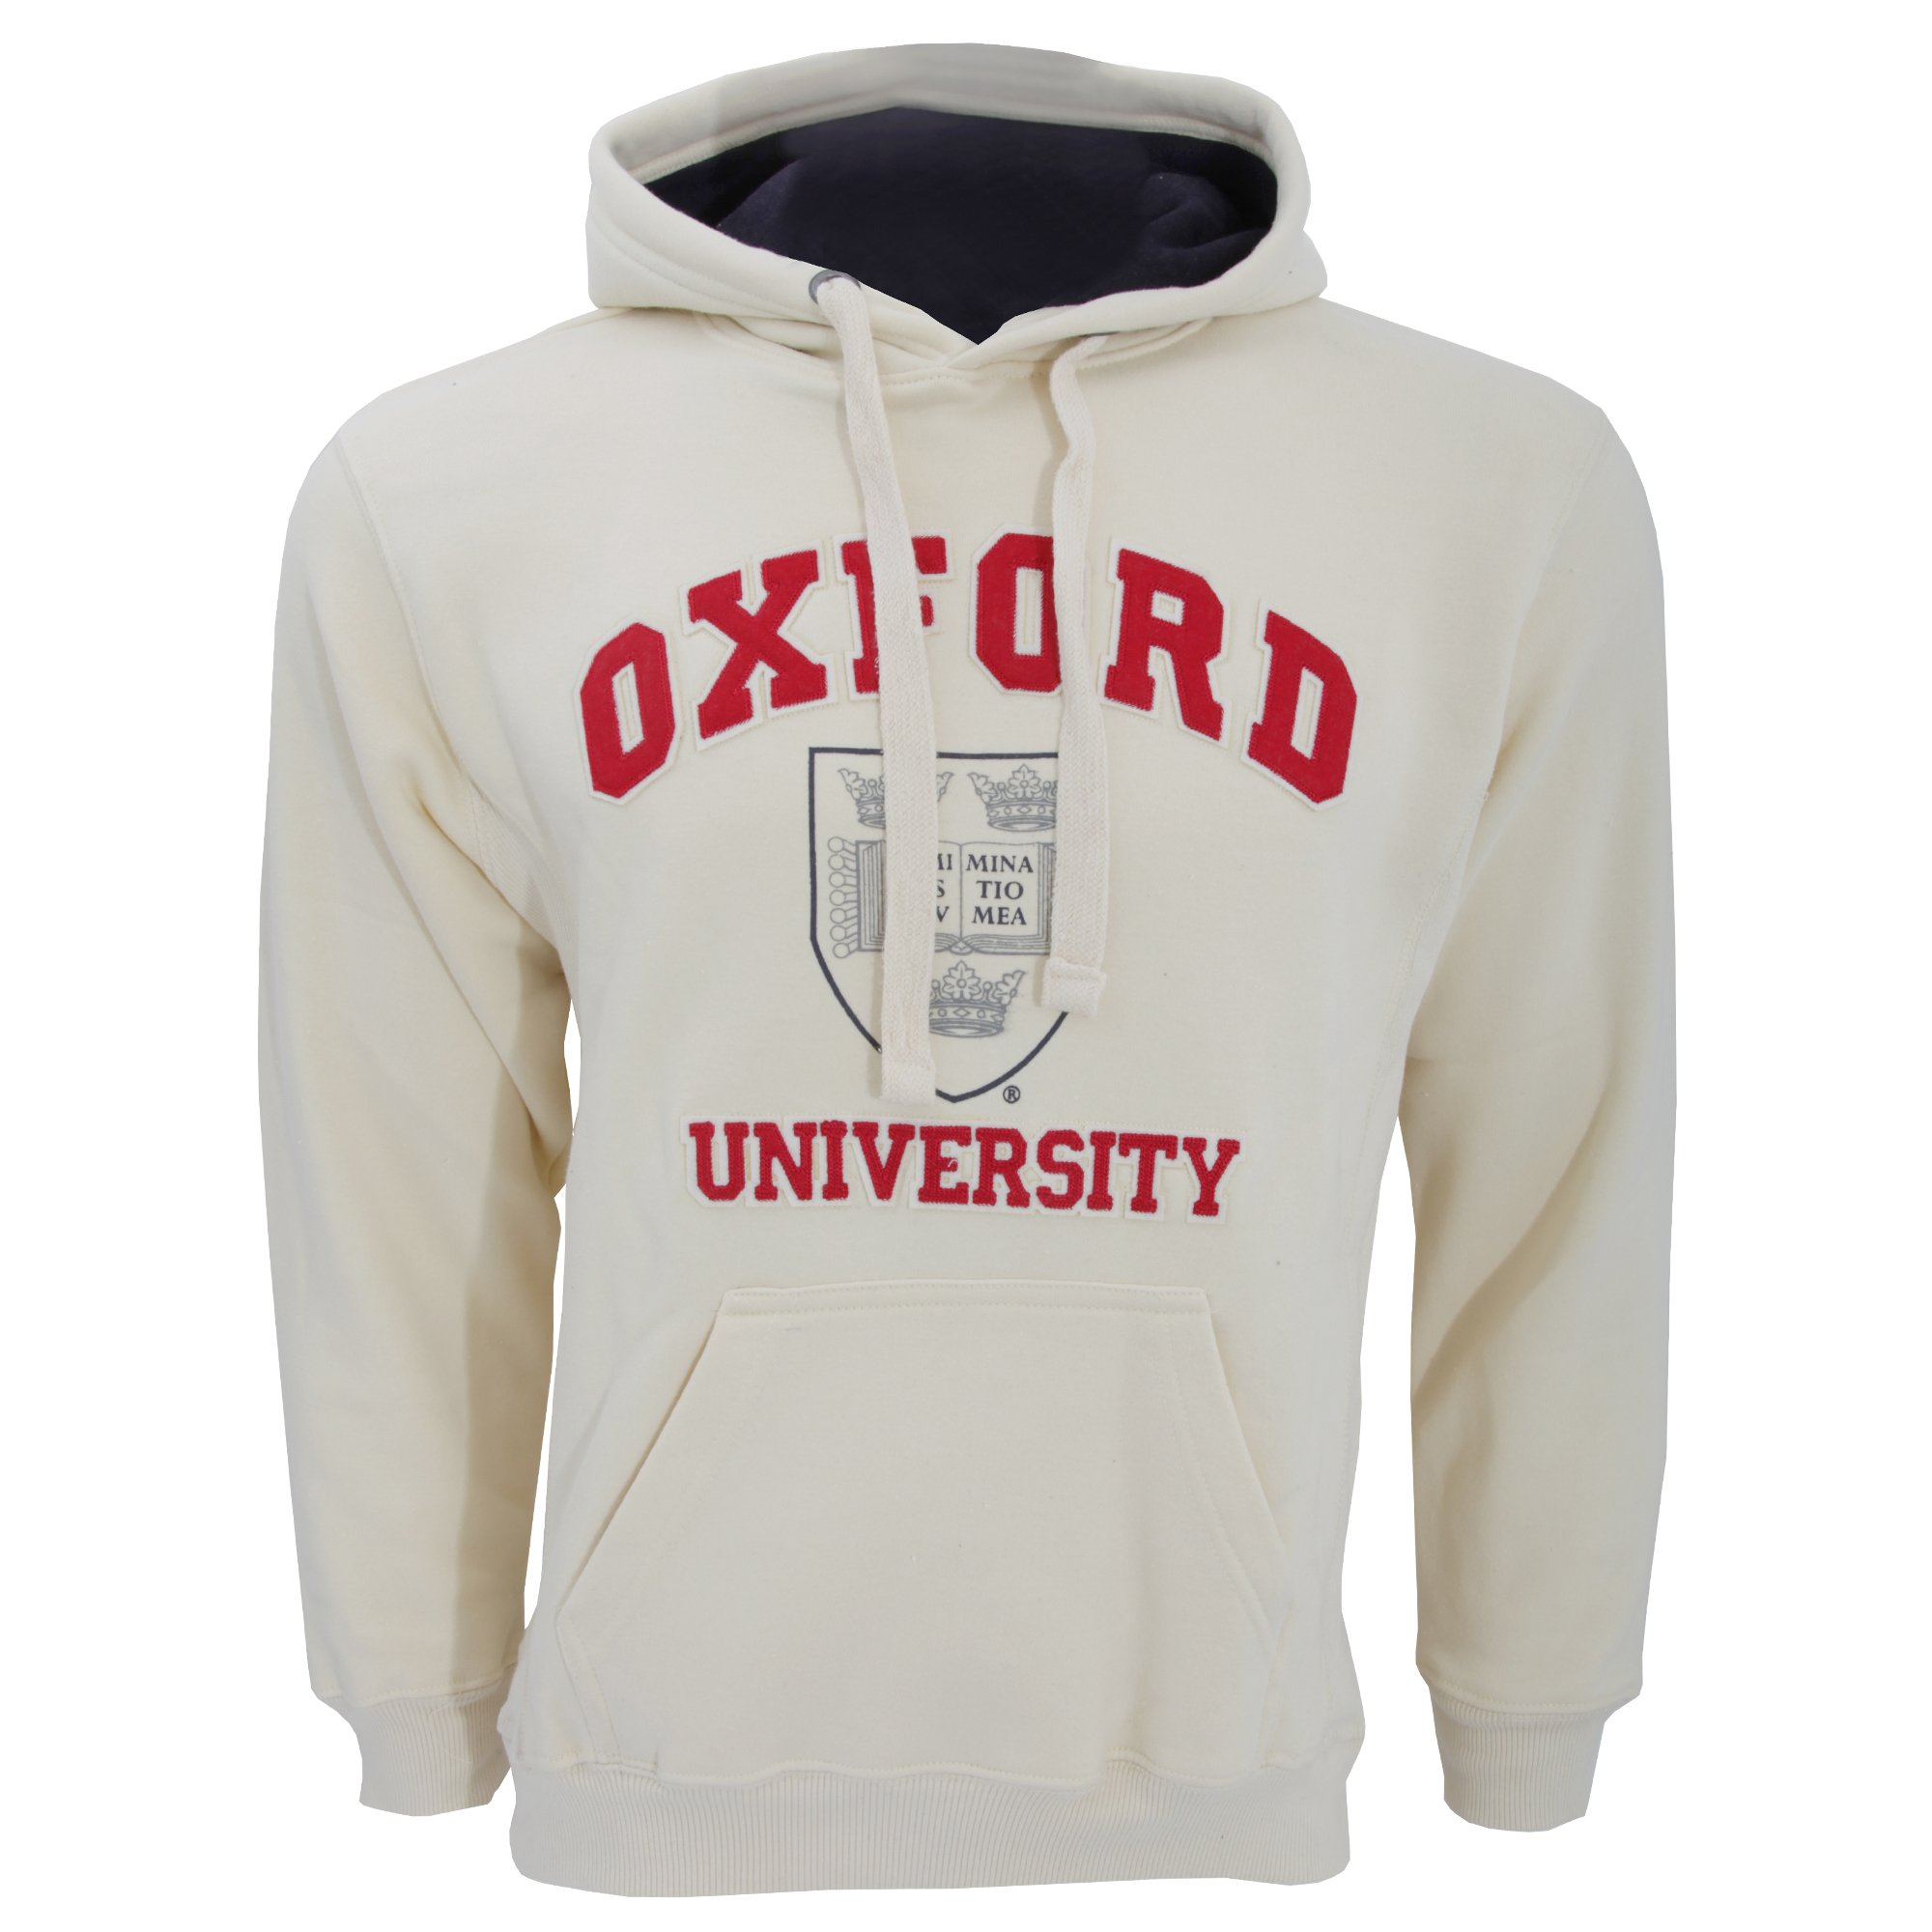 Oxford University Unisex Sweatshirt